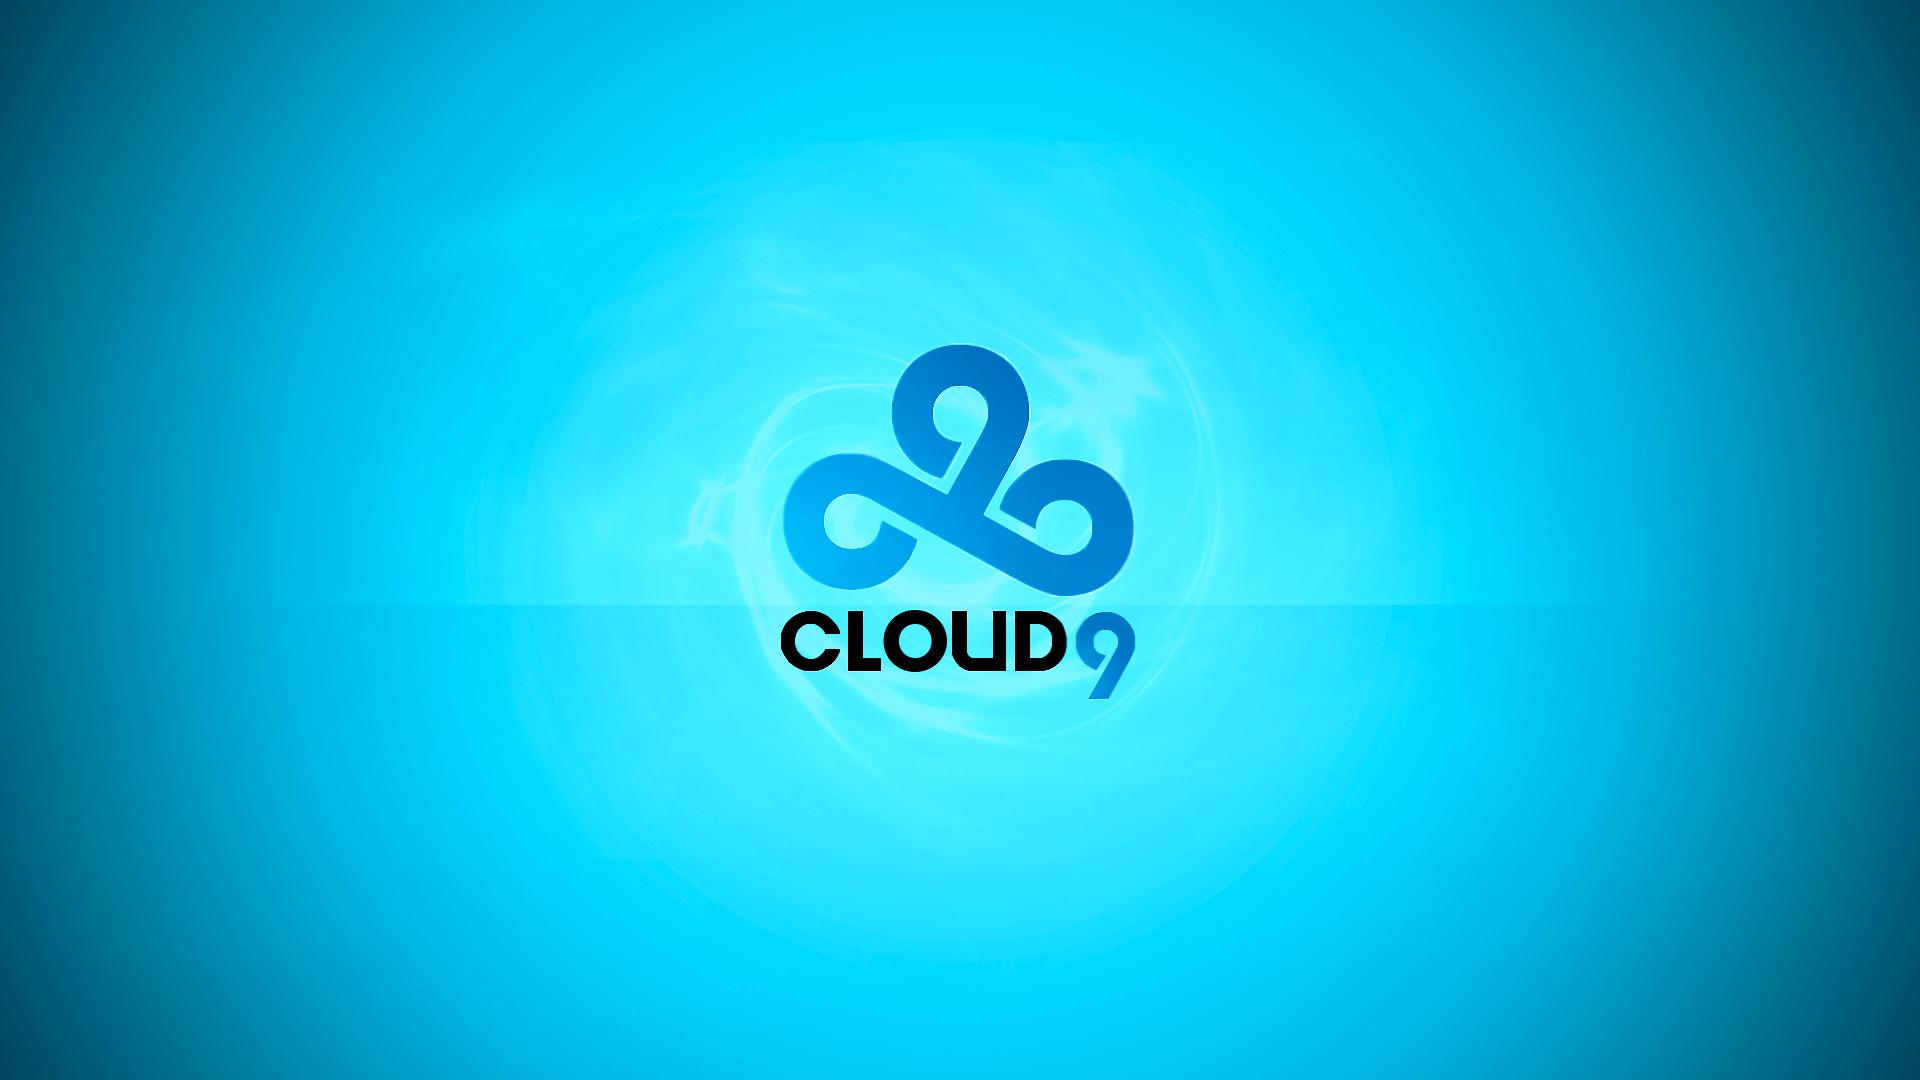 Team Cloud 9 Wallpaper 1080p By Selack On Deviantart